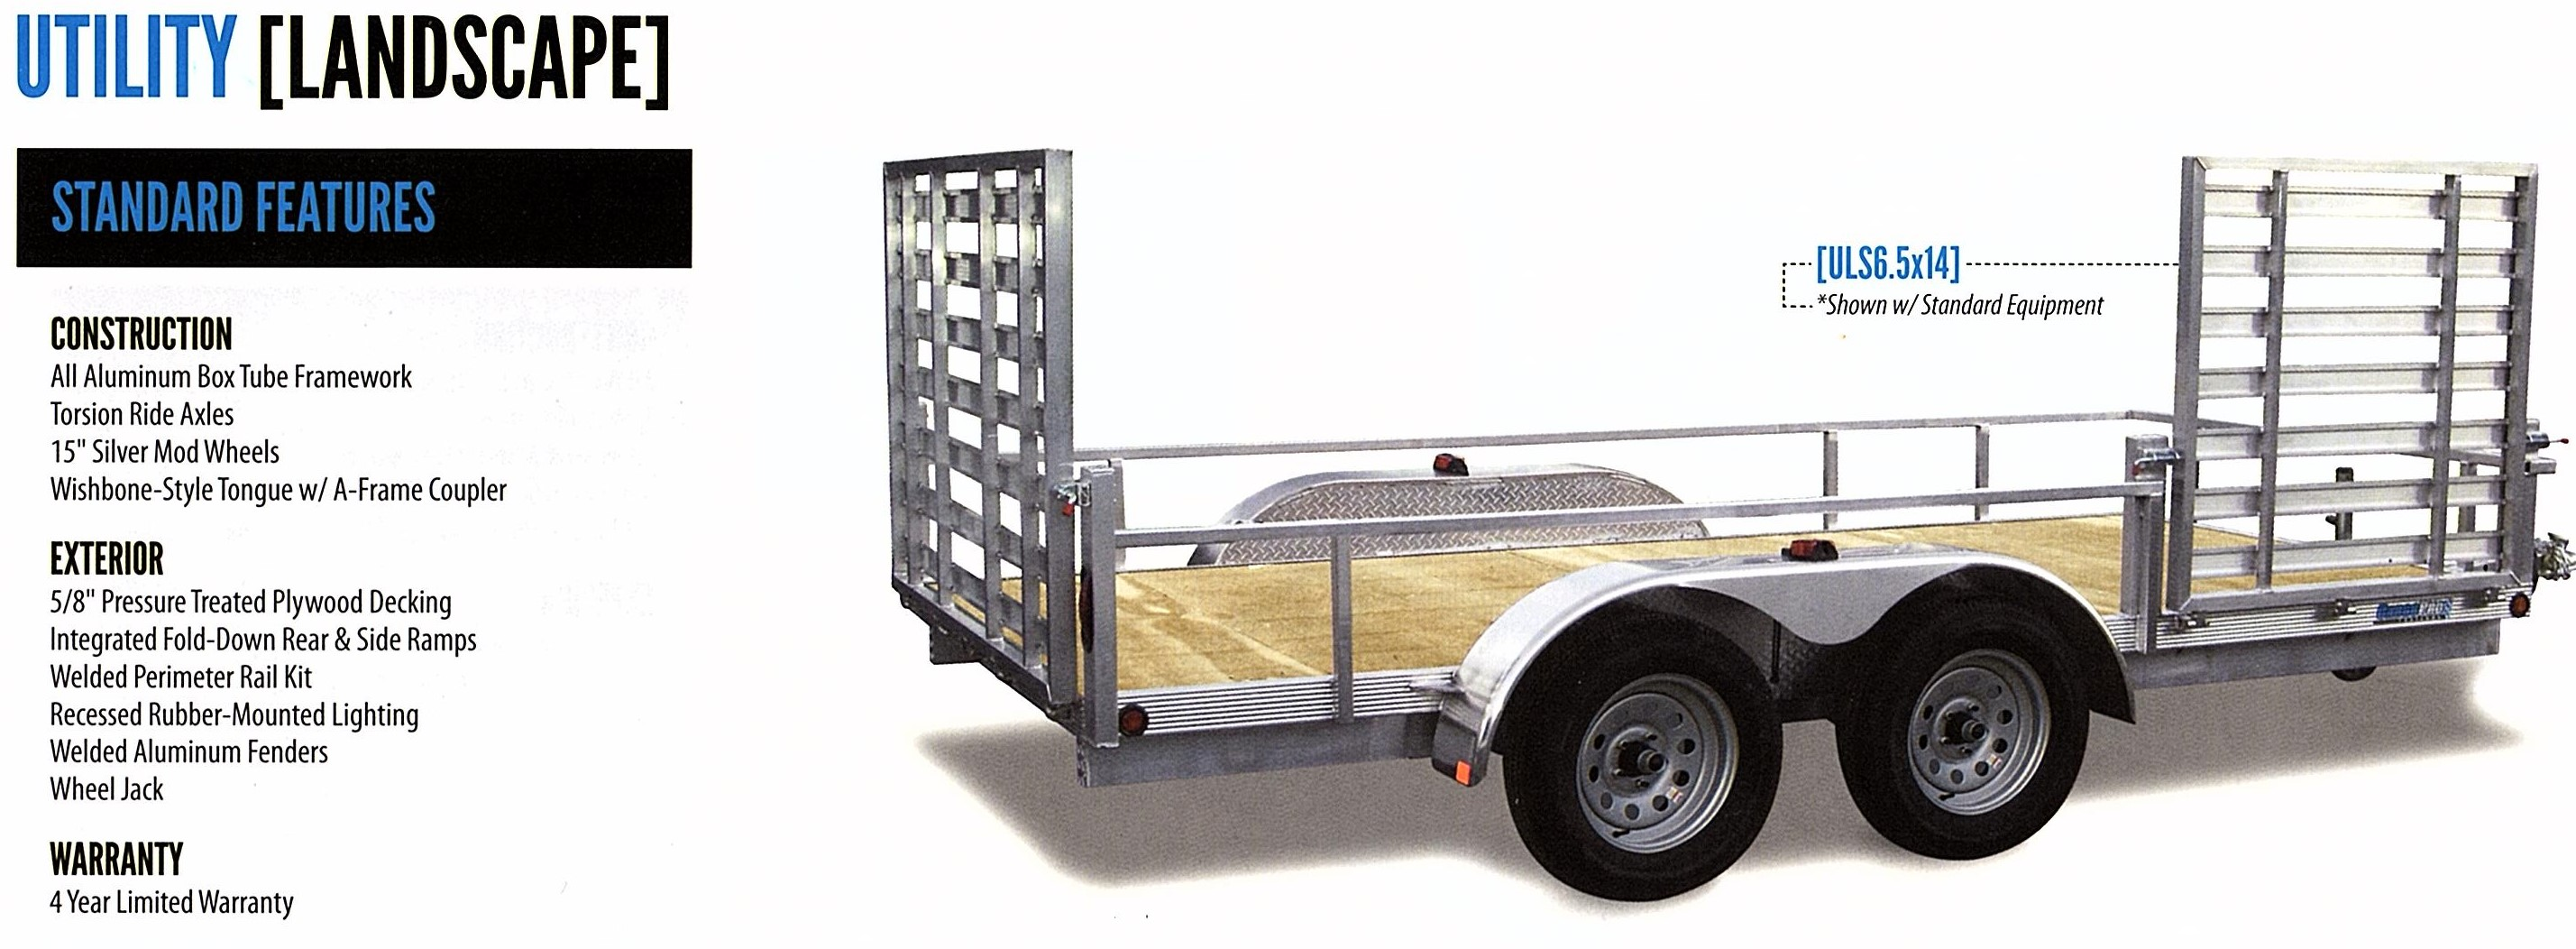 landscape utility trailer aluminum